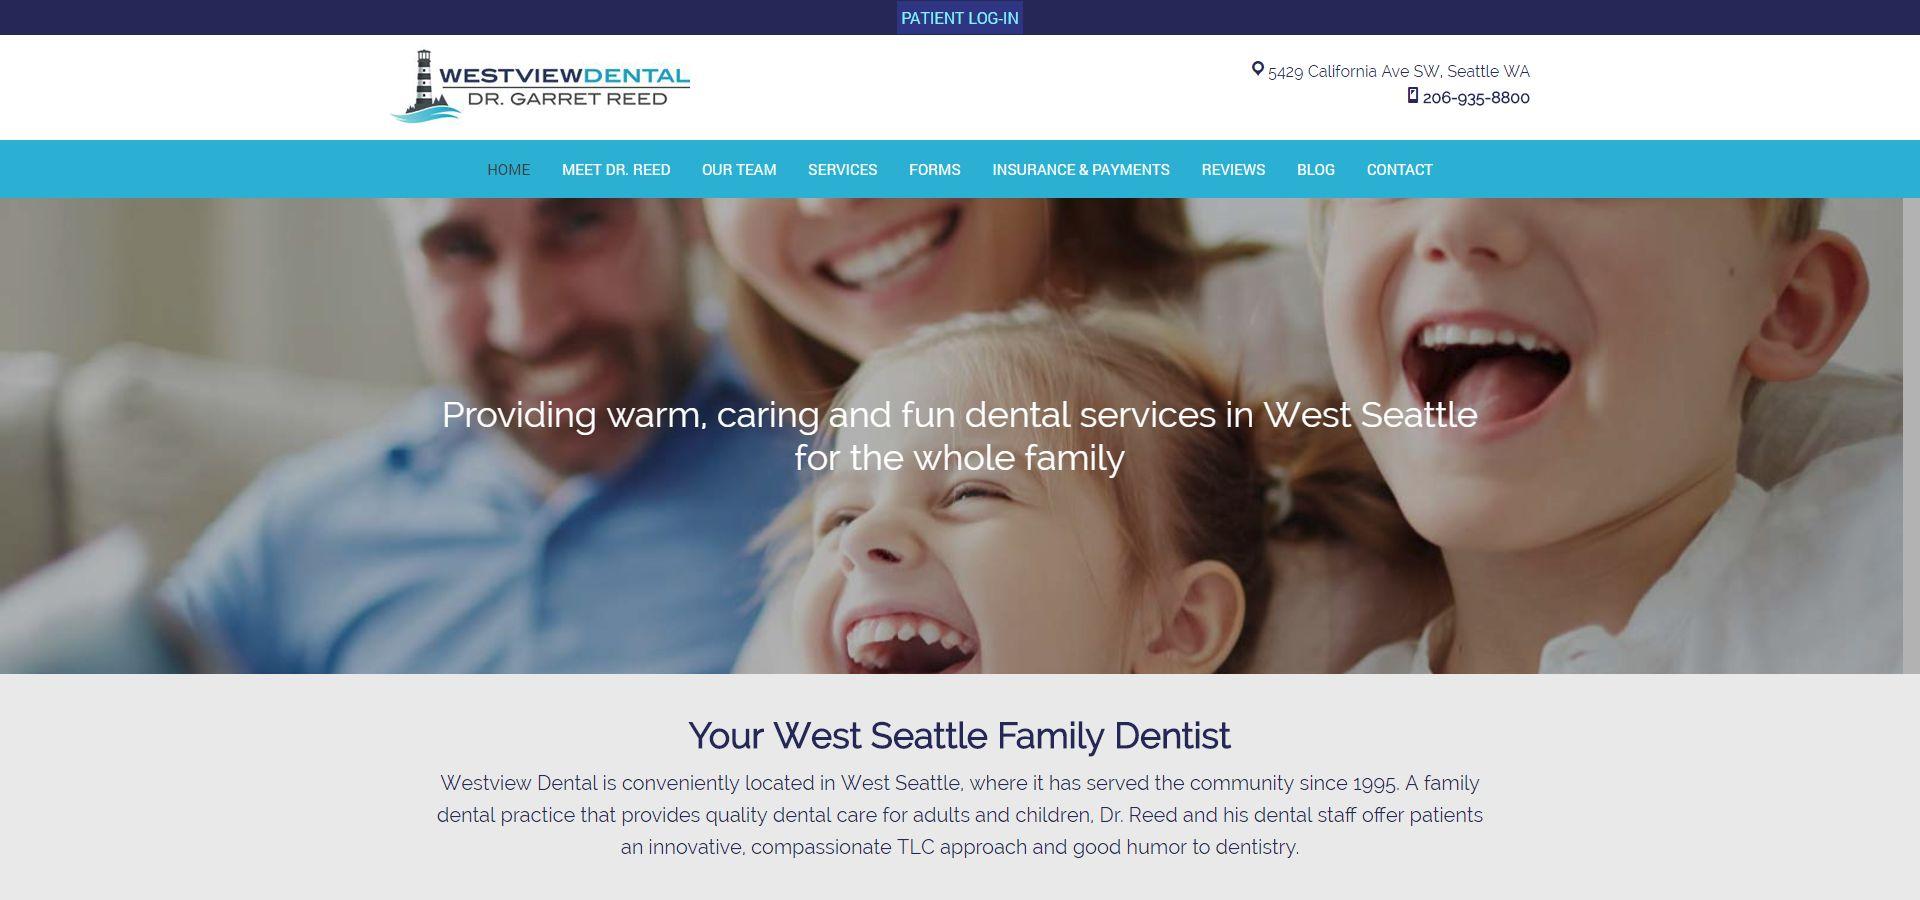 Westview Dental